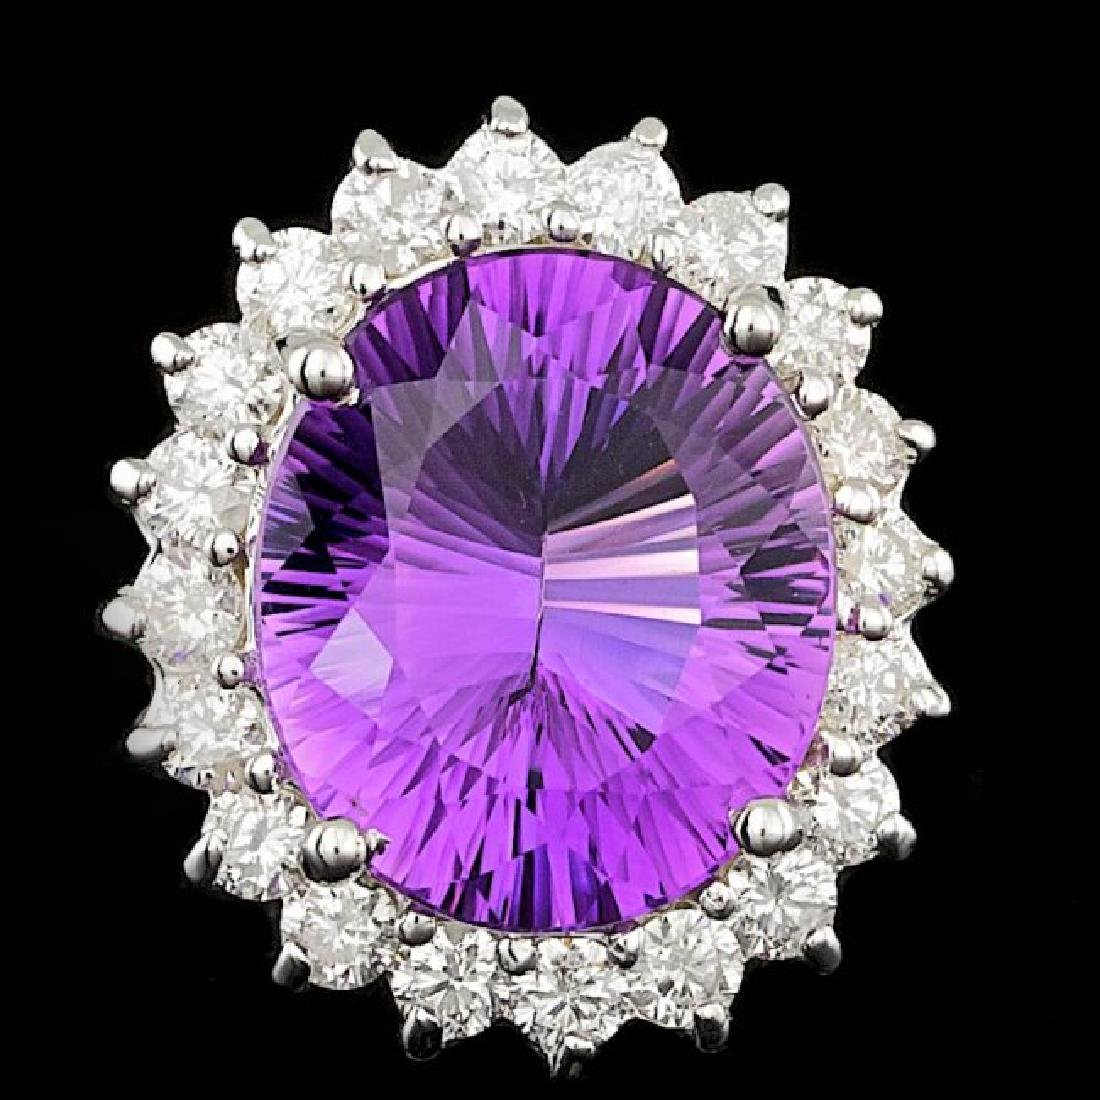 14k Gold 5.00ct Amethyst 1.00ct Diamond Ring